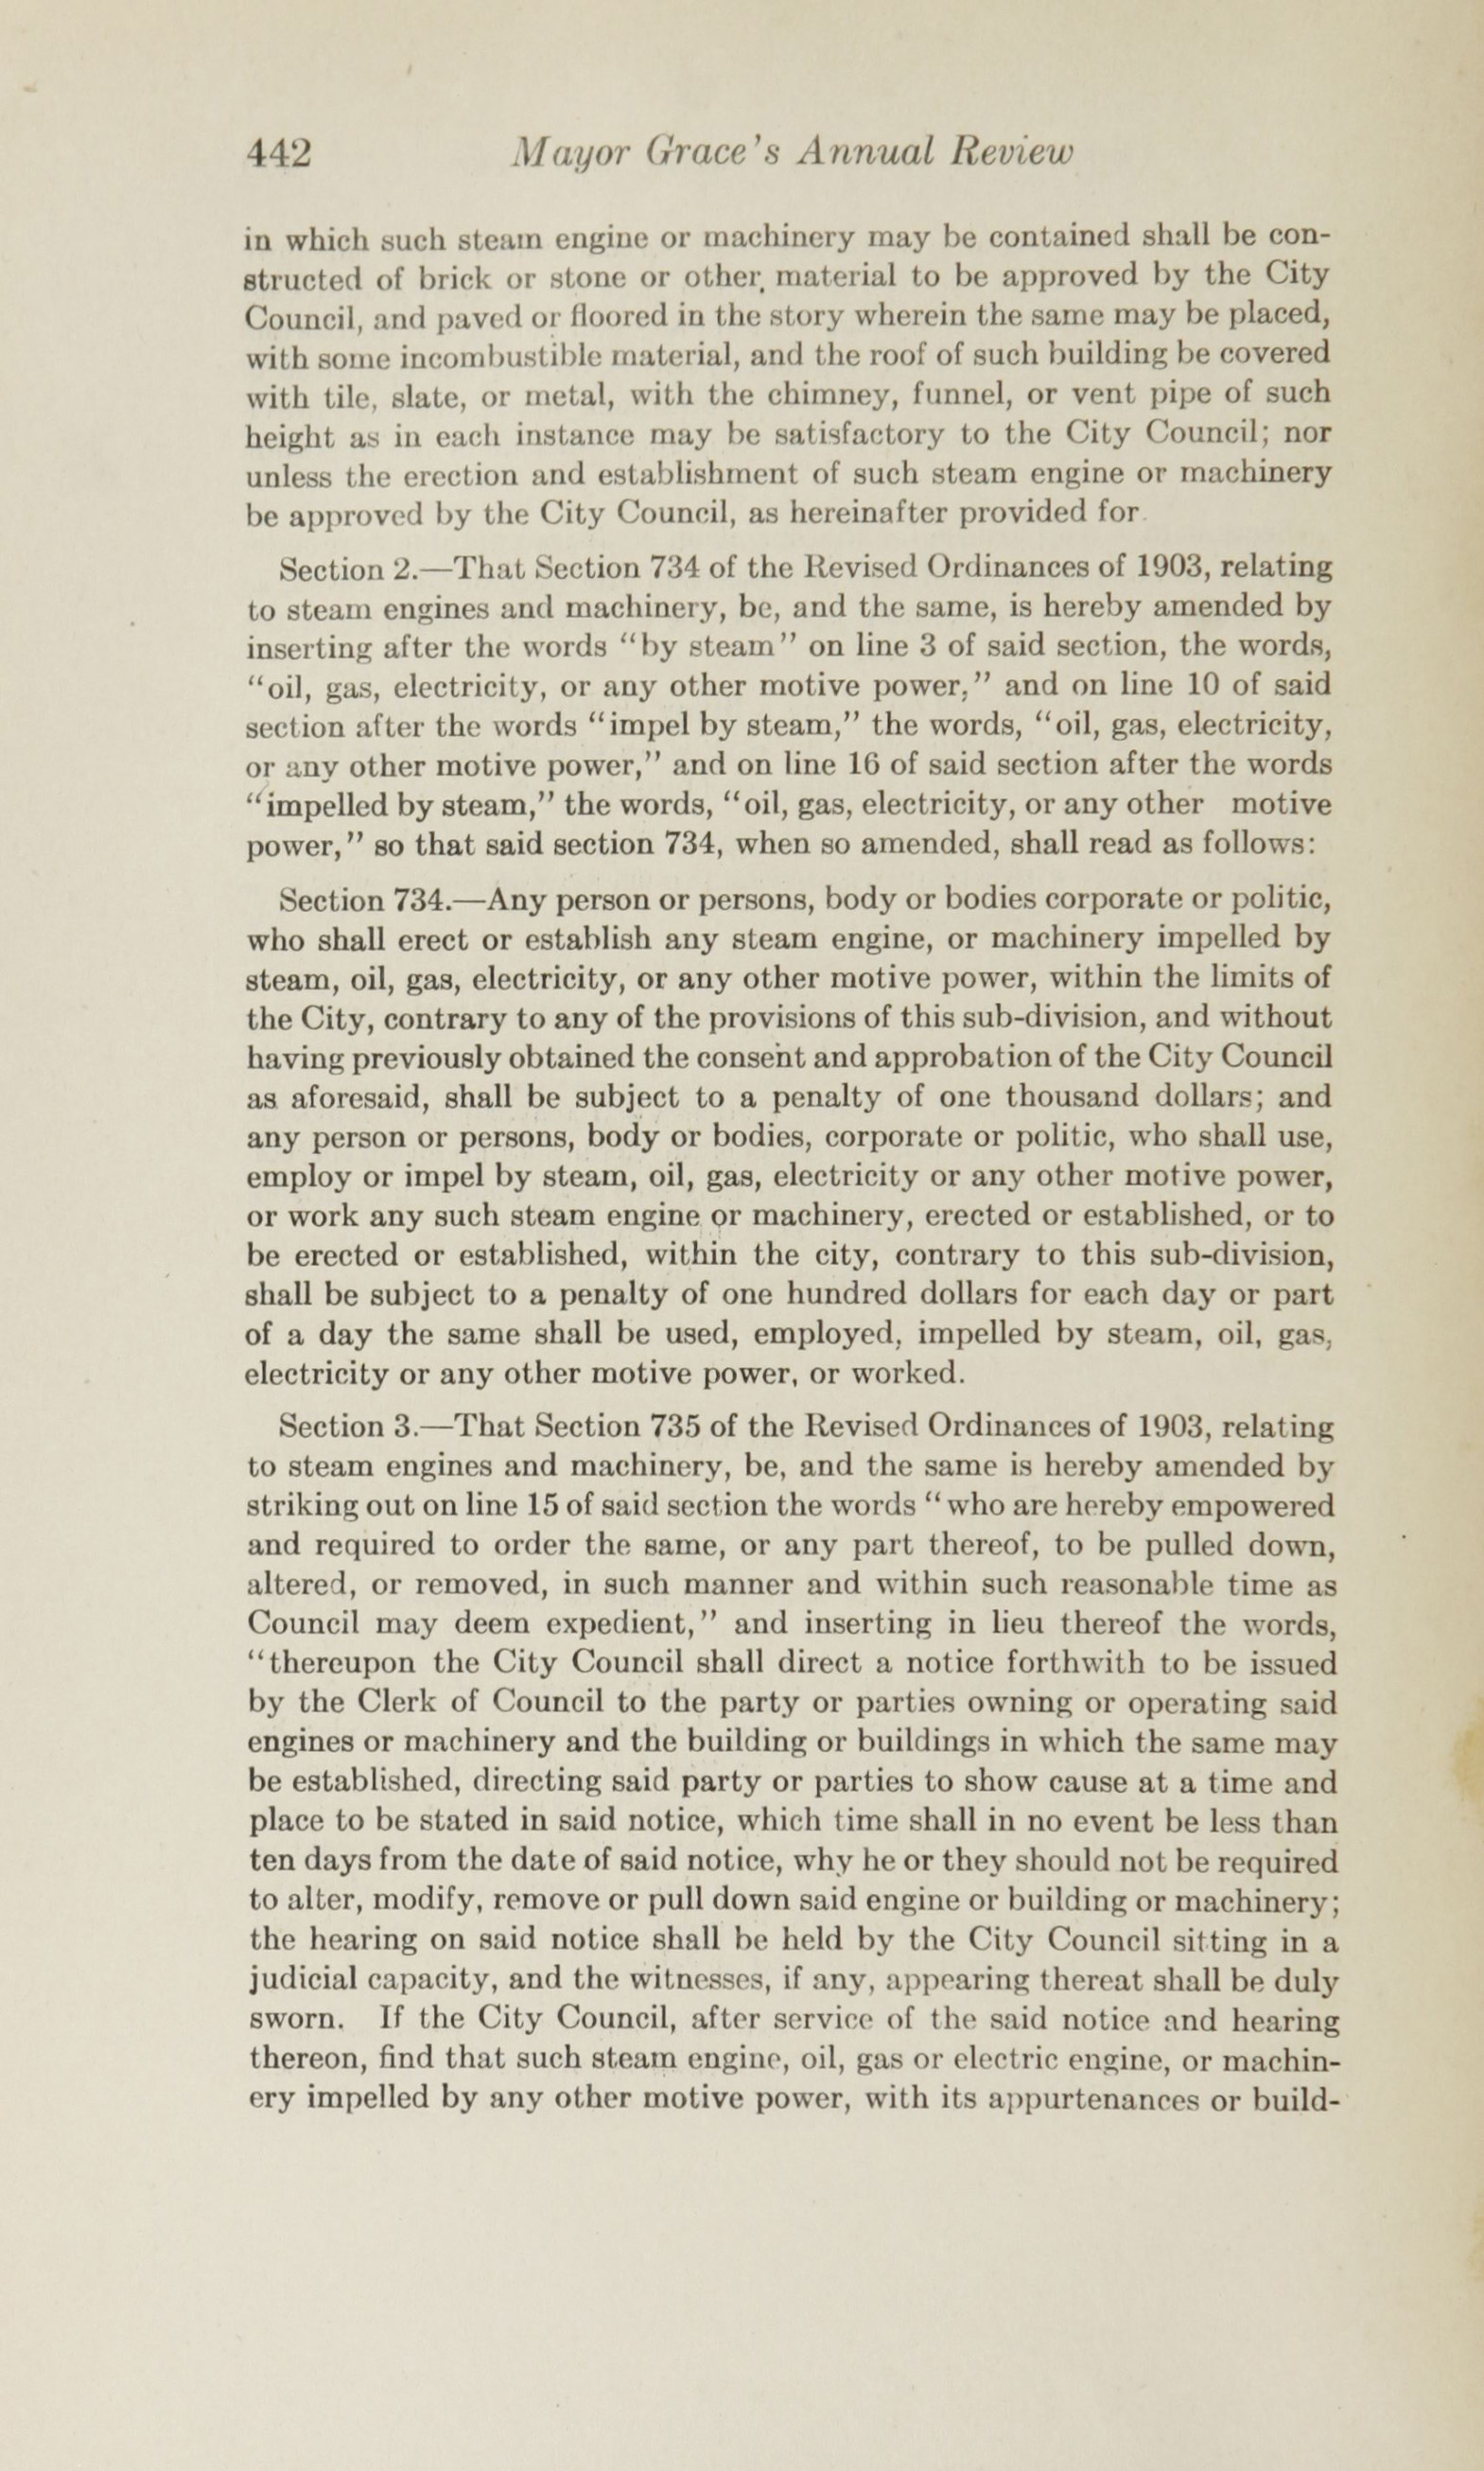 Charleston Yearbook, 1915, page 442